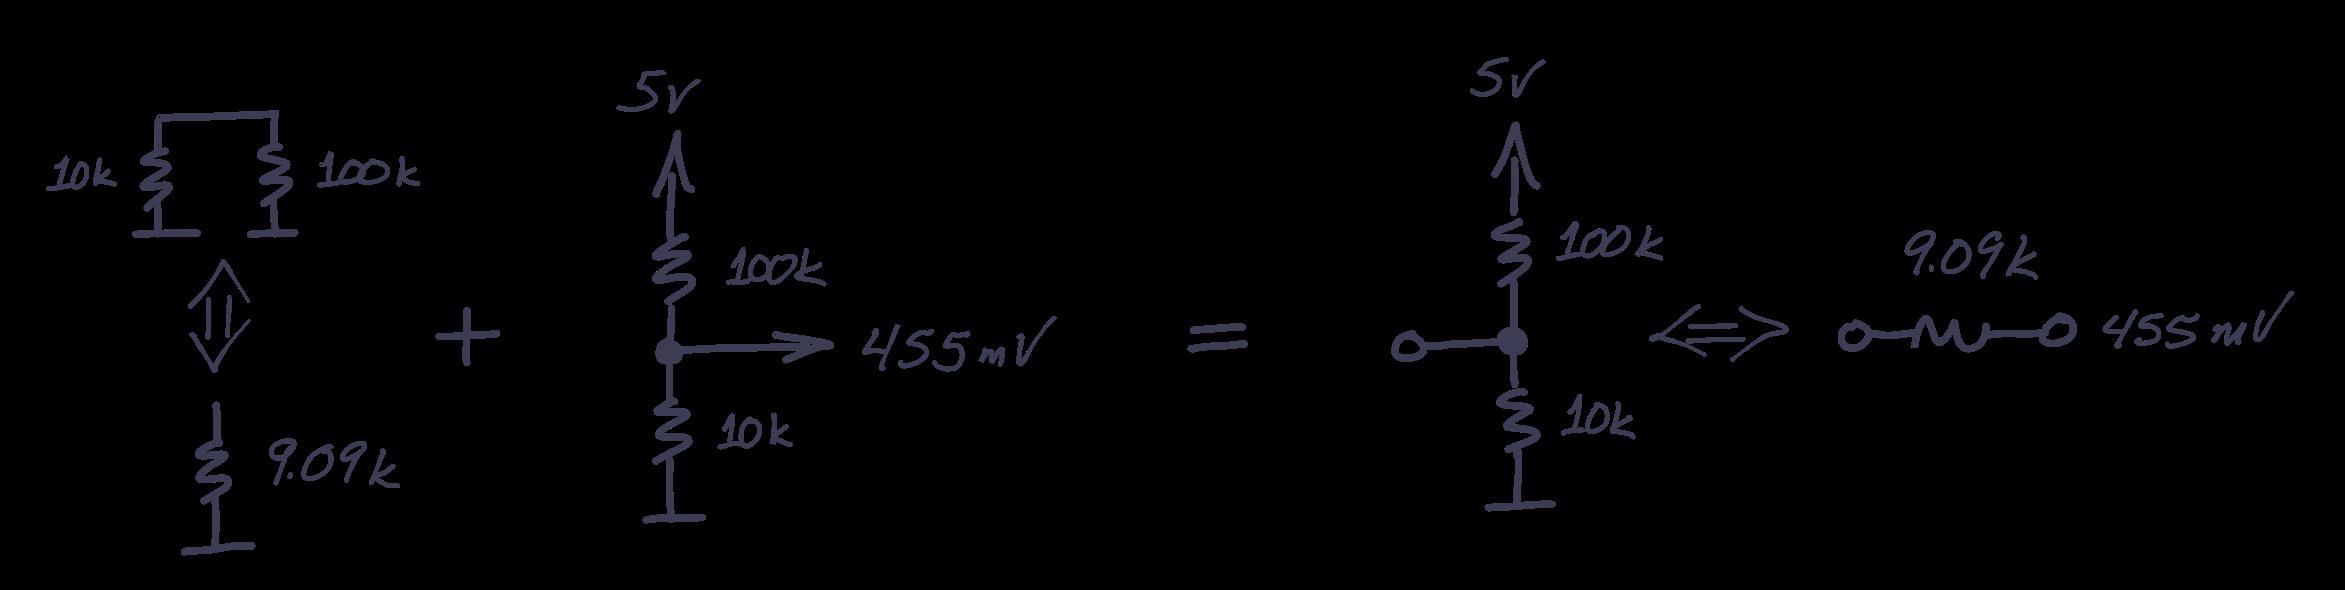 components_bjt-cfp-03.png